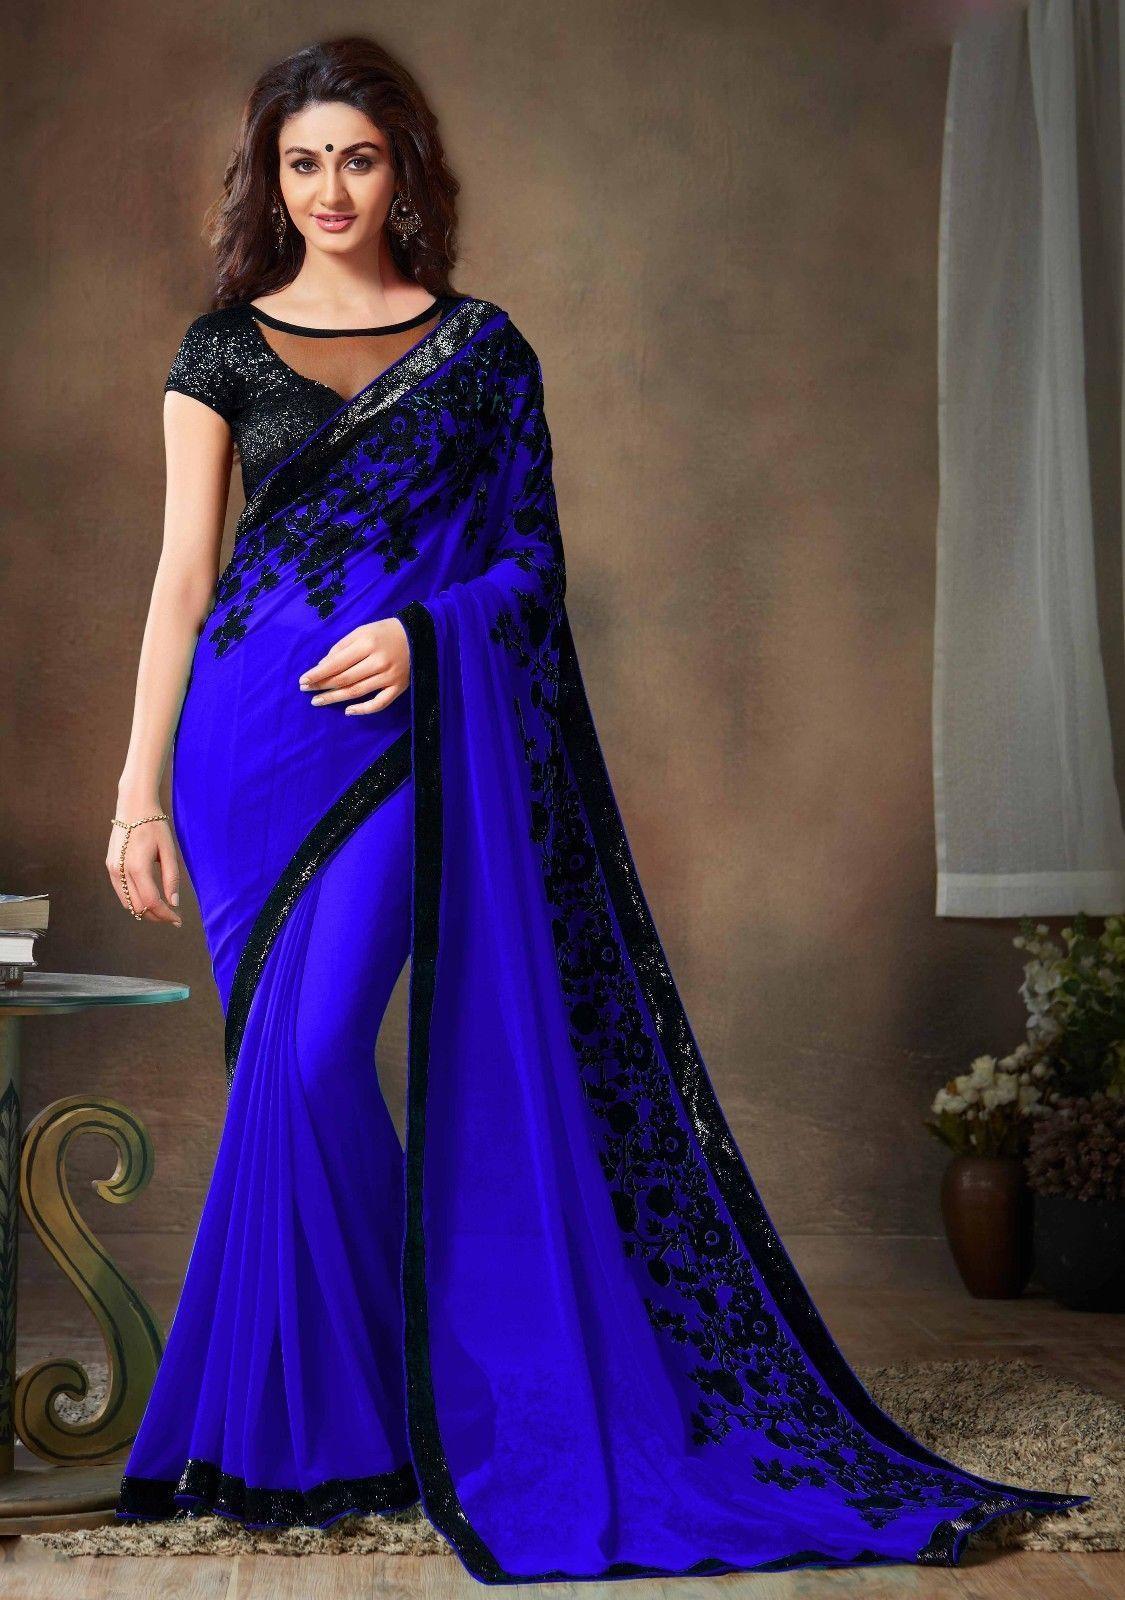 39707c1cfa7a8 Bollywood Indian Pakistani Ethnic Party Wear Saree Designer Sari with Blouse